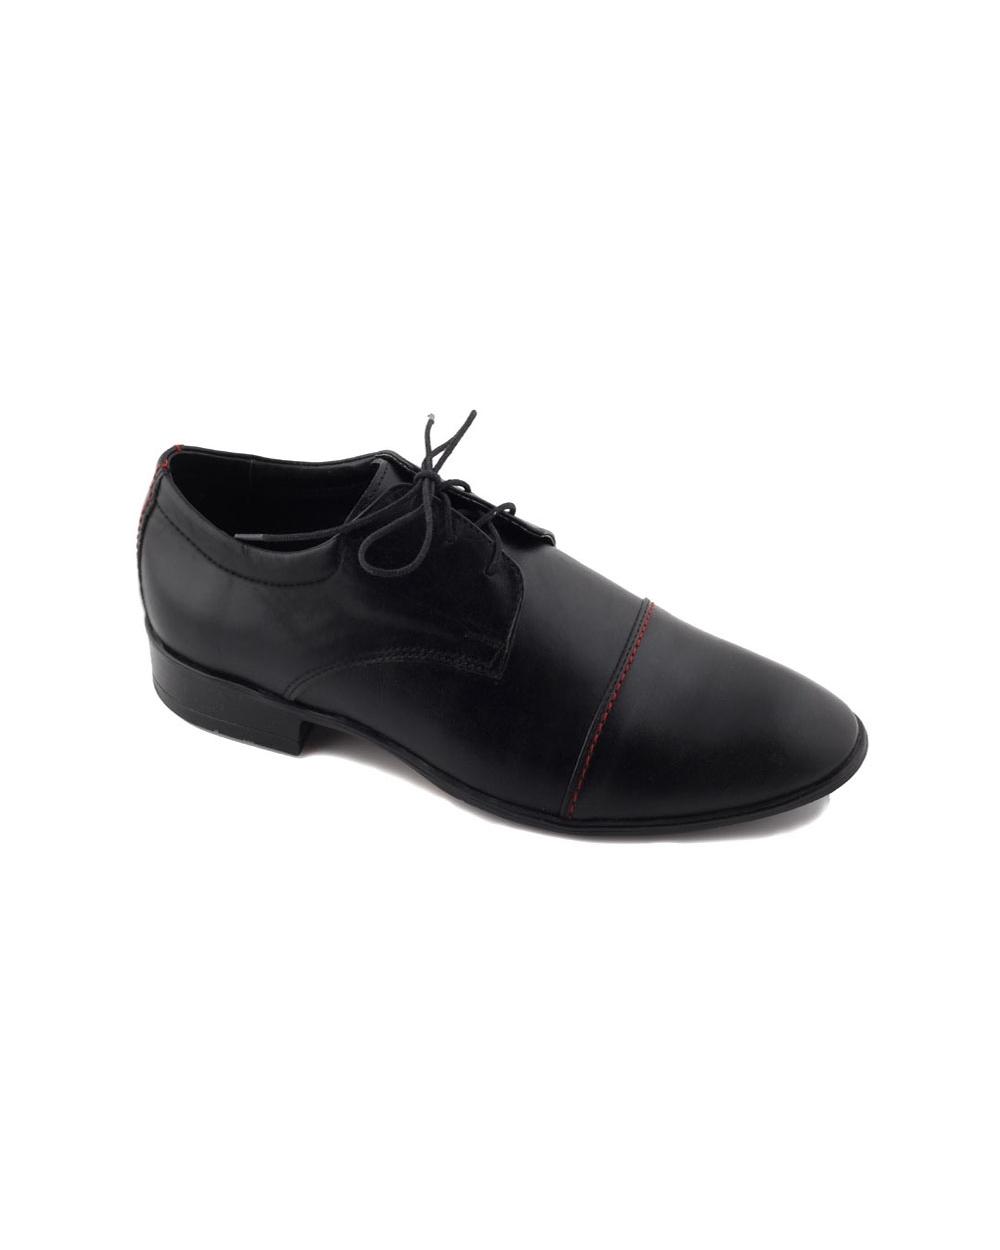 eab4d58fa041e9 Eleganckie obuwie chłopięce 34 - 39 Rob